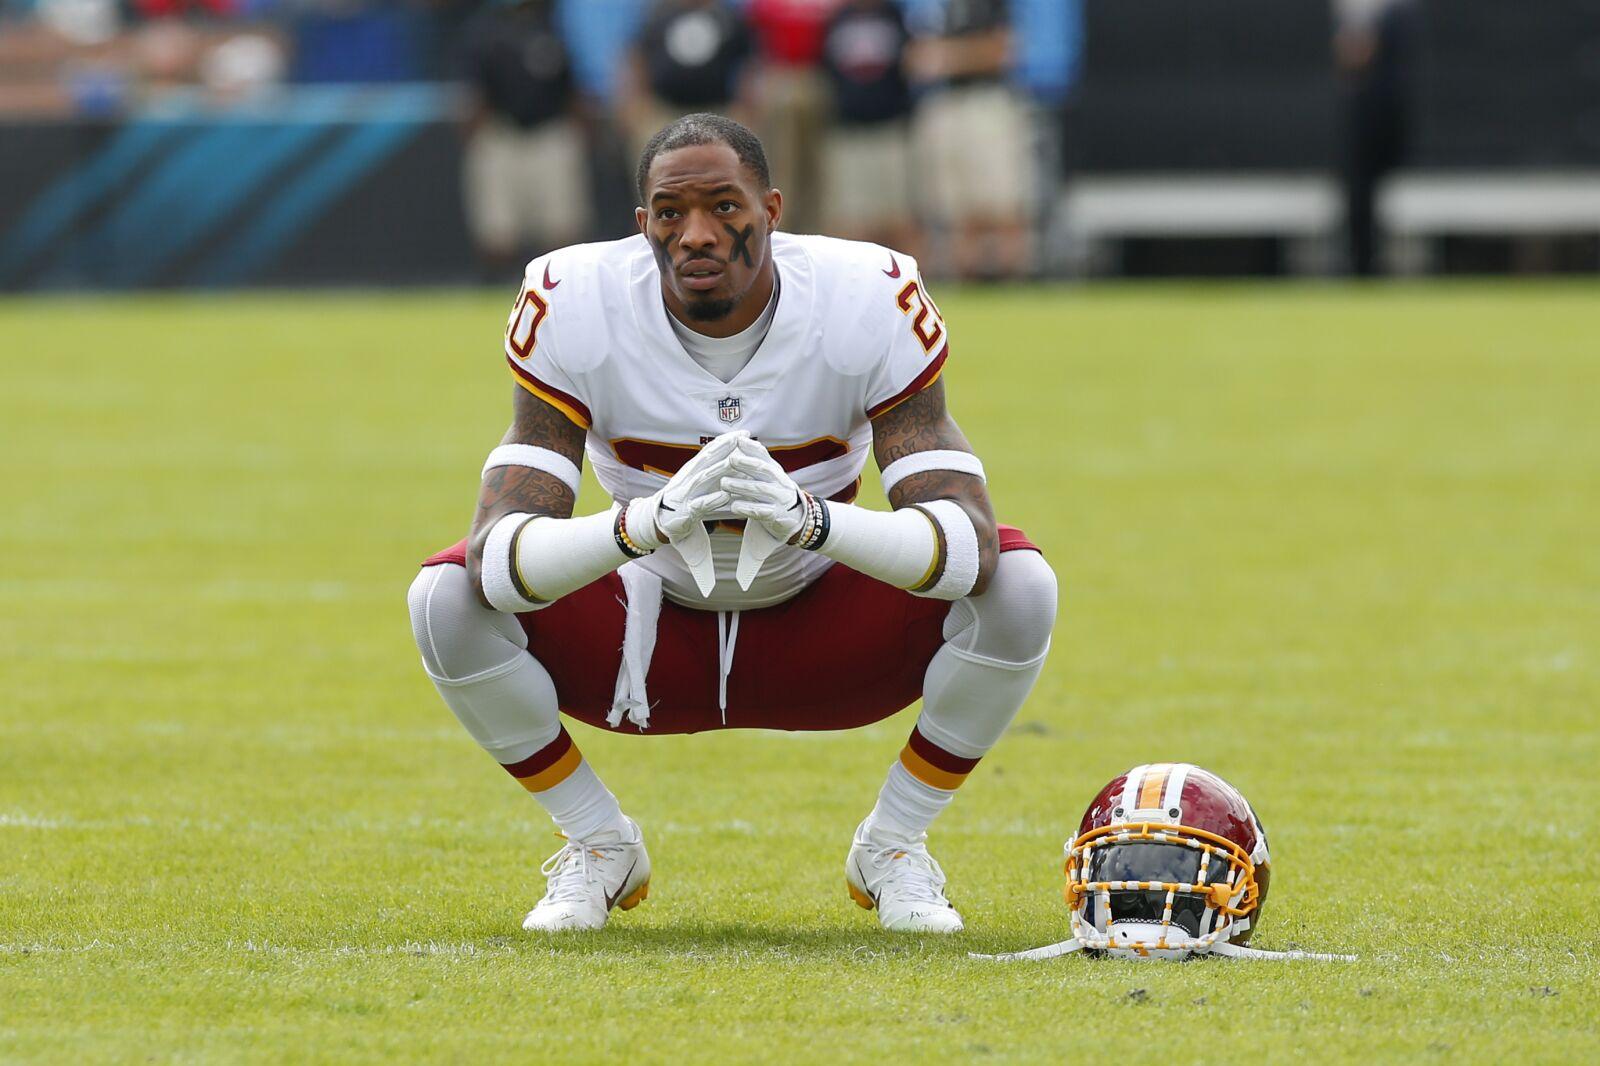 (Photo by David Rosenblum/Icon Sportswire via Getty Images)